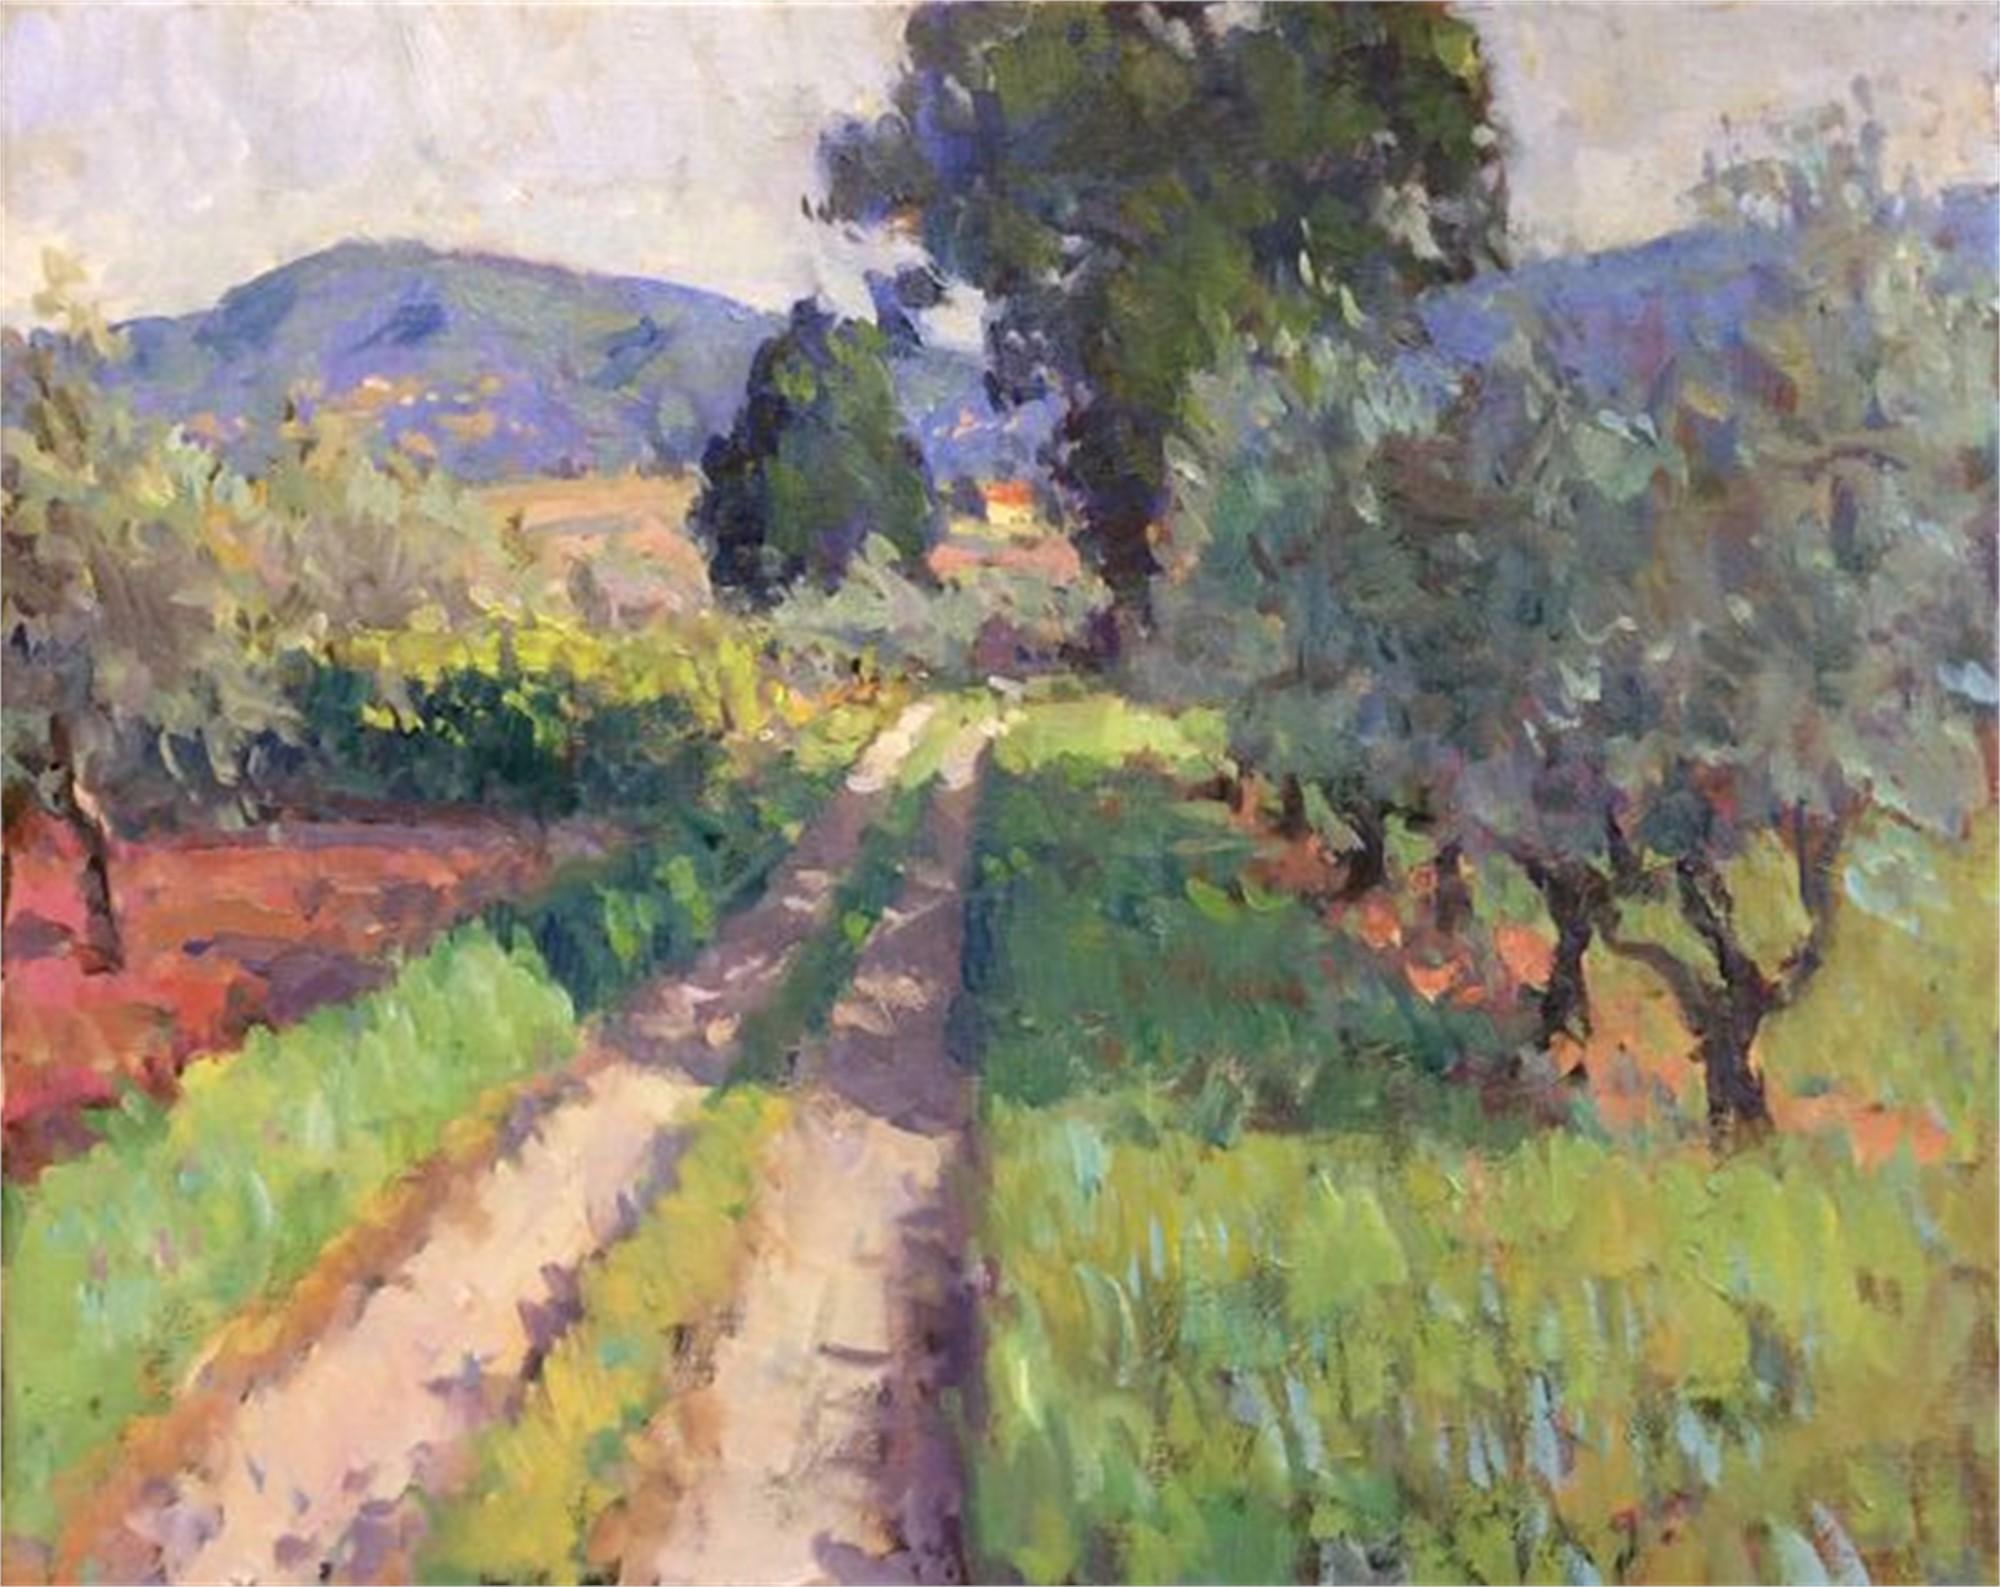 Tuscan Road by Richard Oversmith